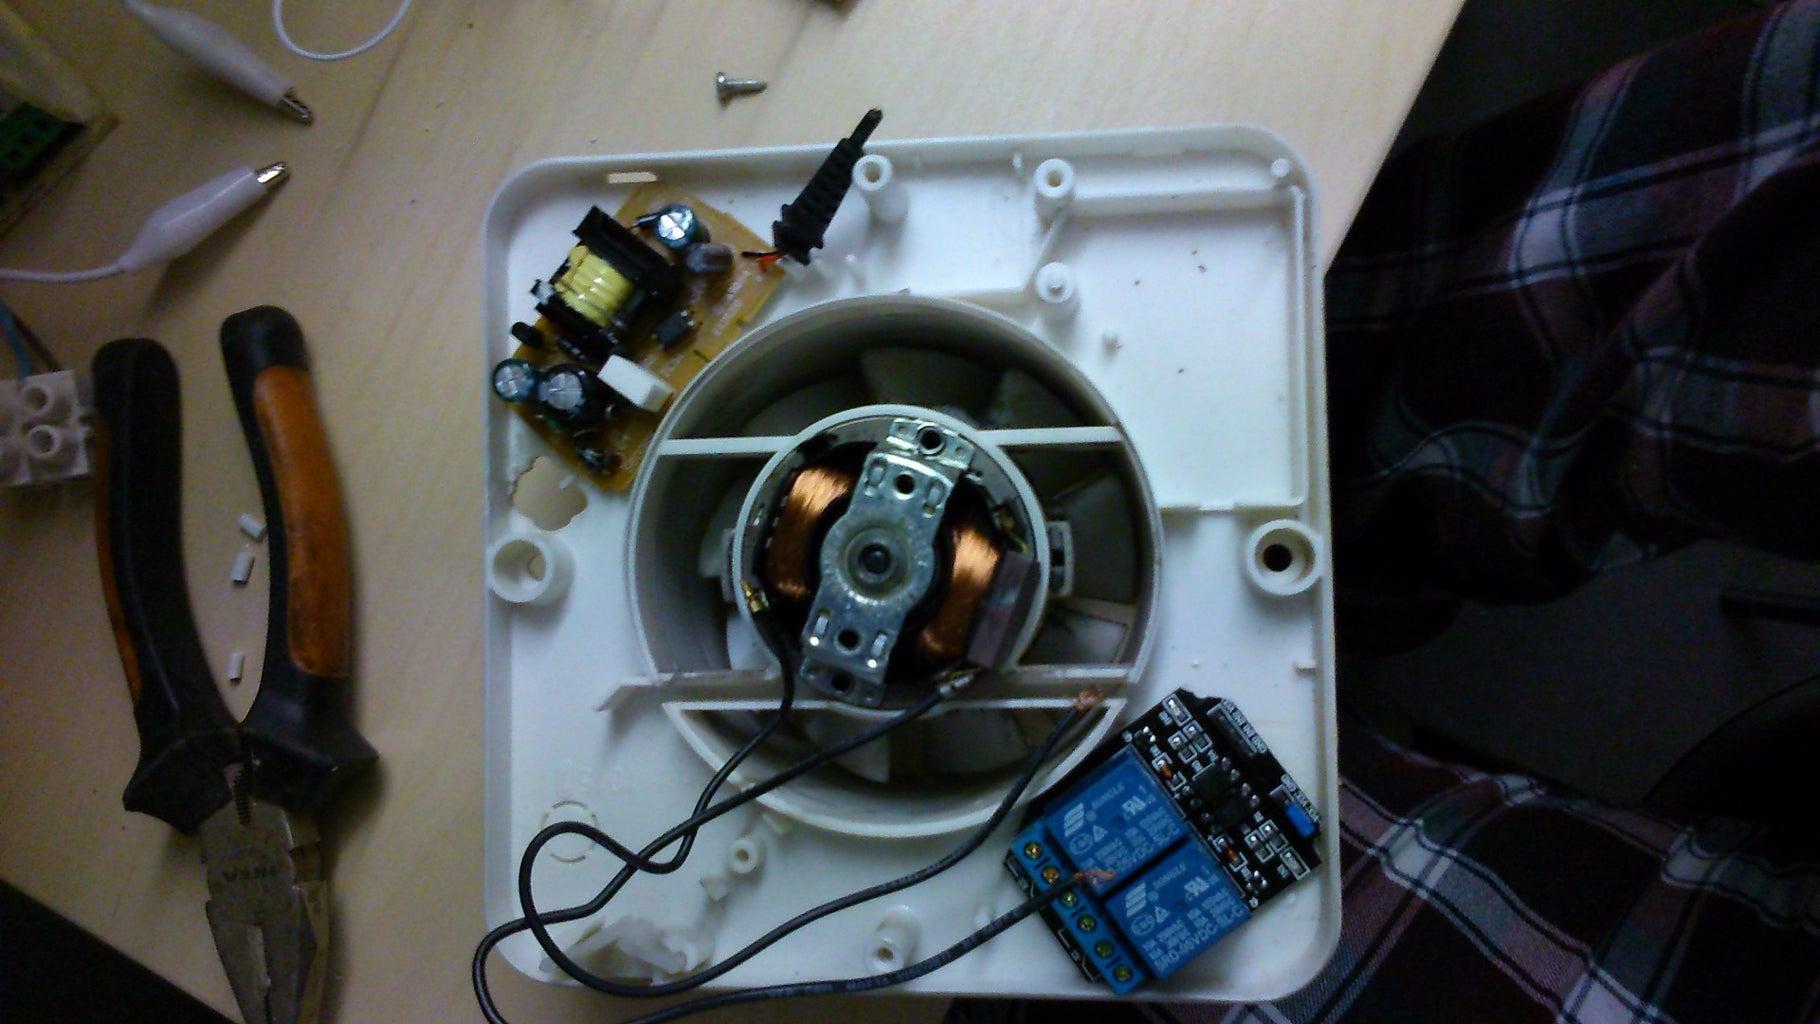 Add 5V Power Supply